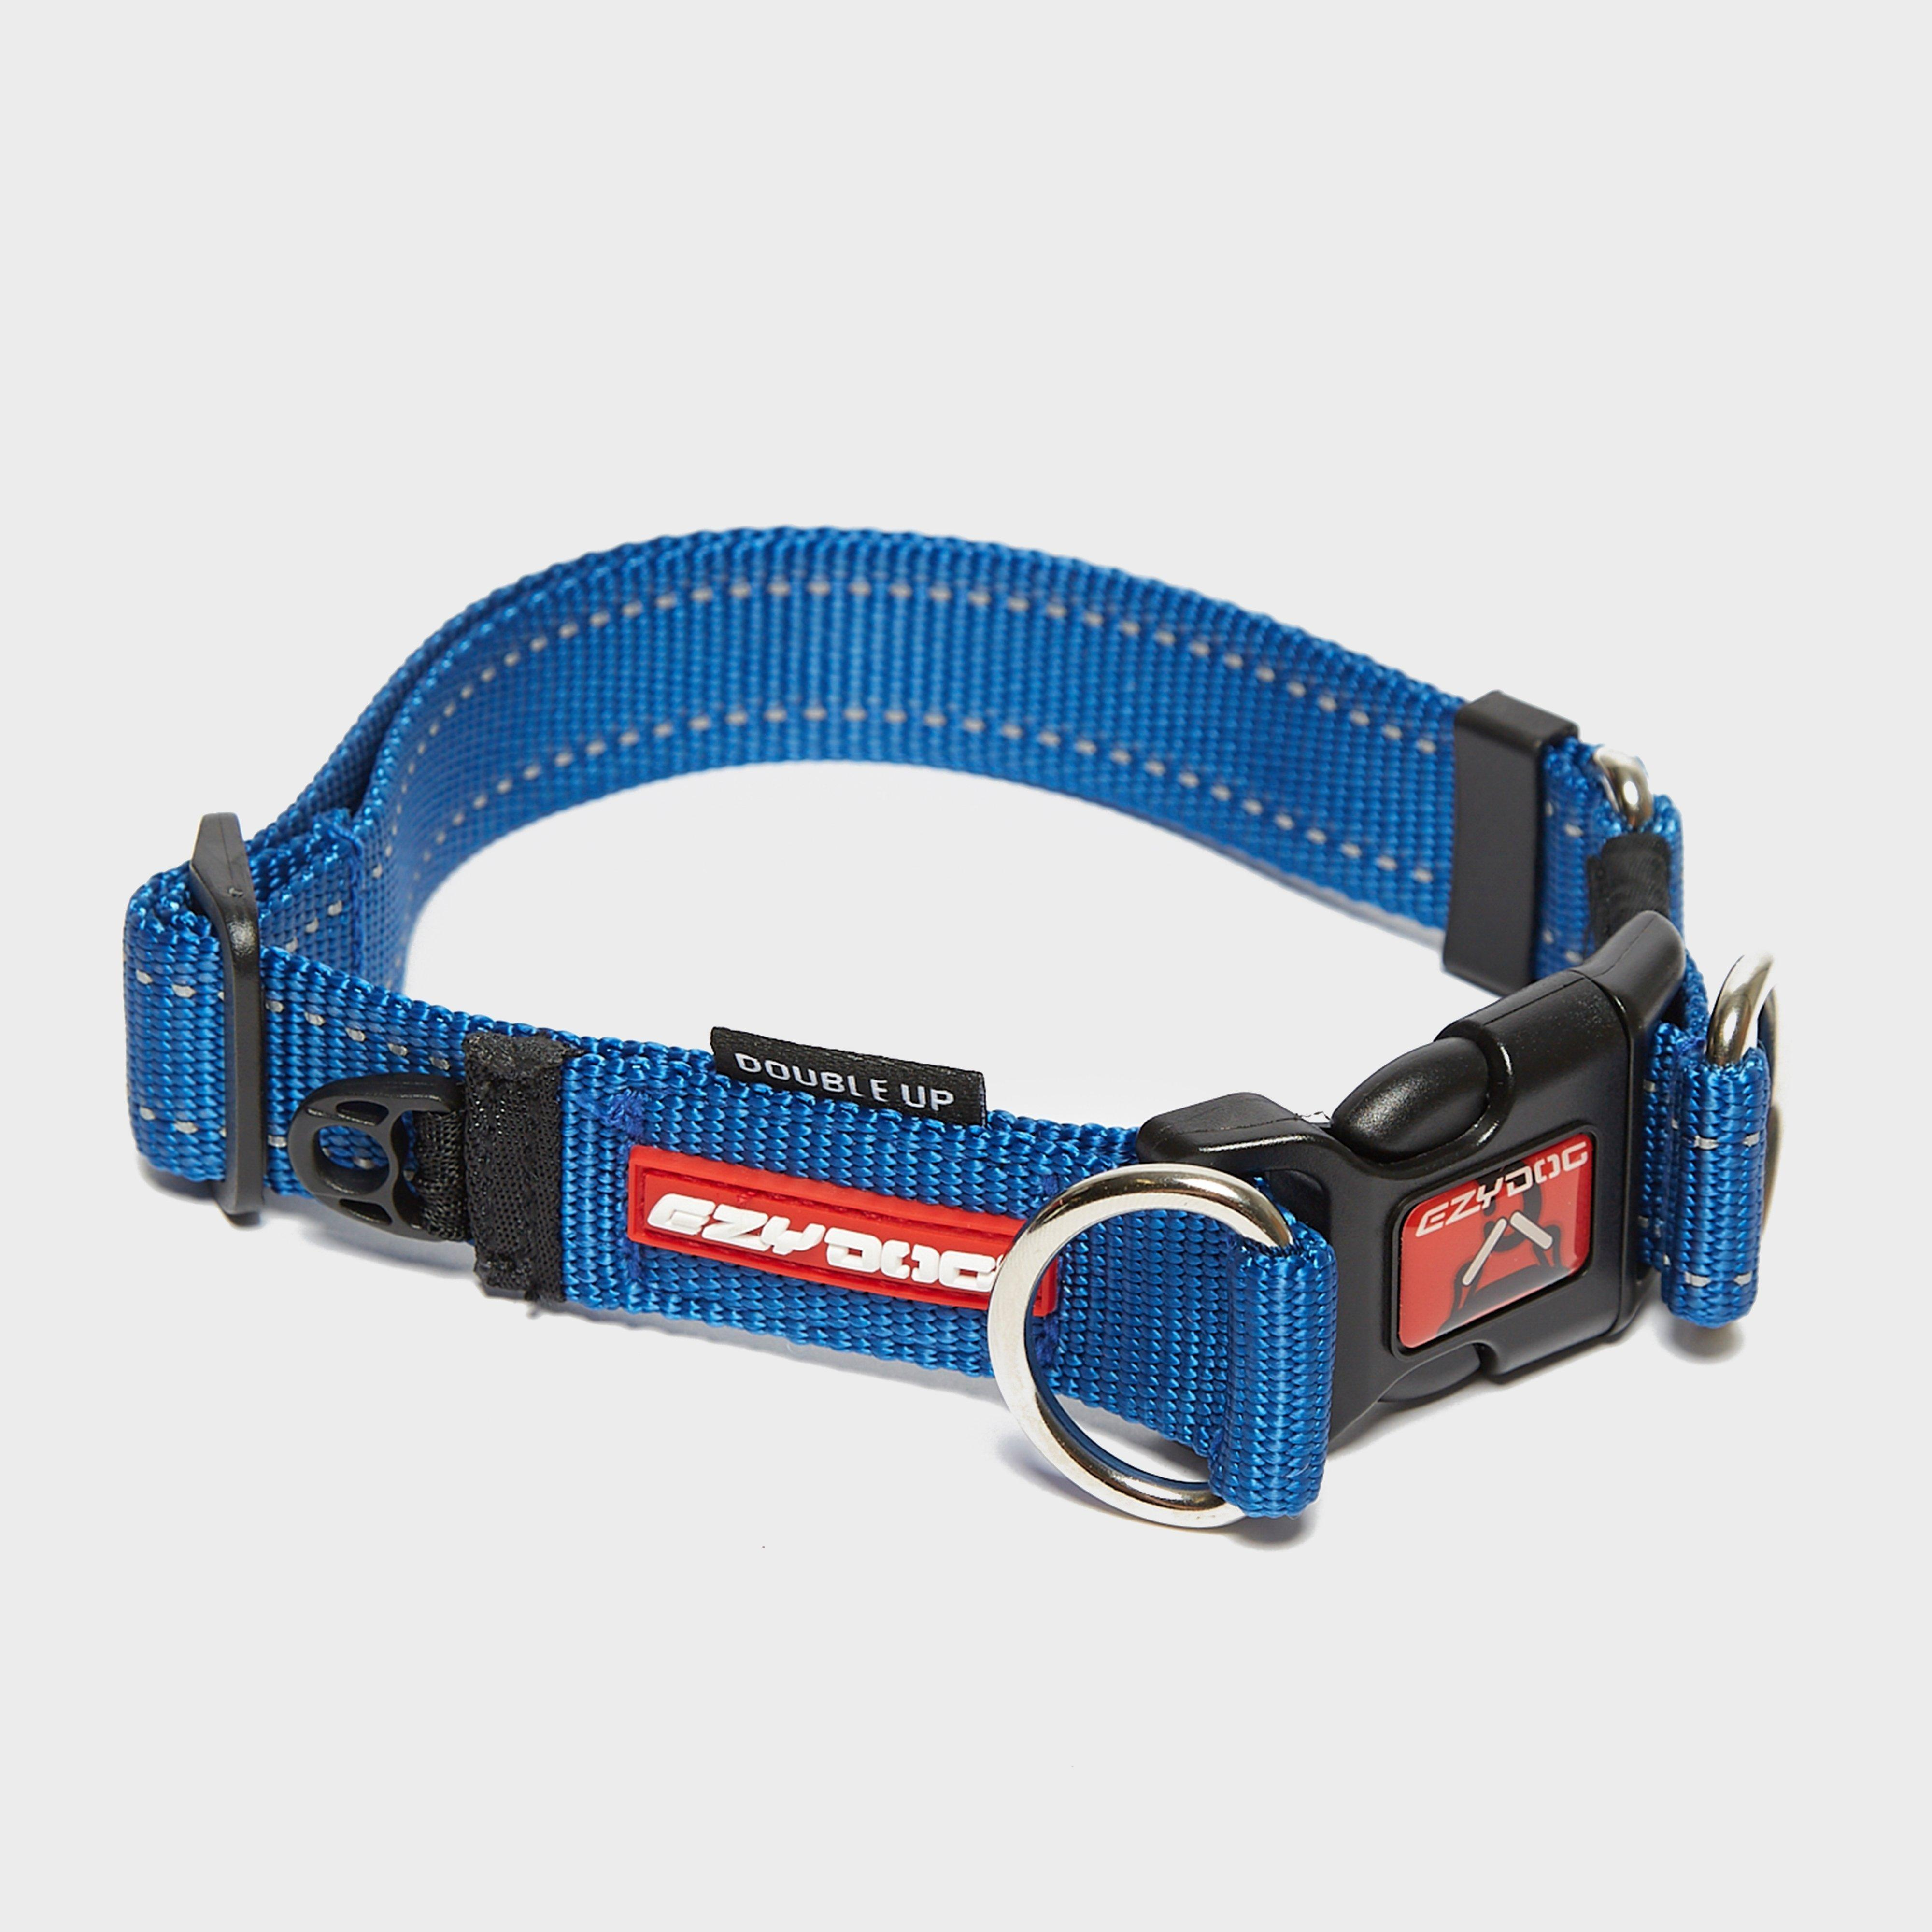 Image of Ezy-Dog Double Up Collar Large Blue - Blue/Mbl, Blue/MBL